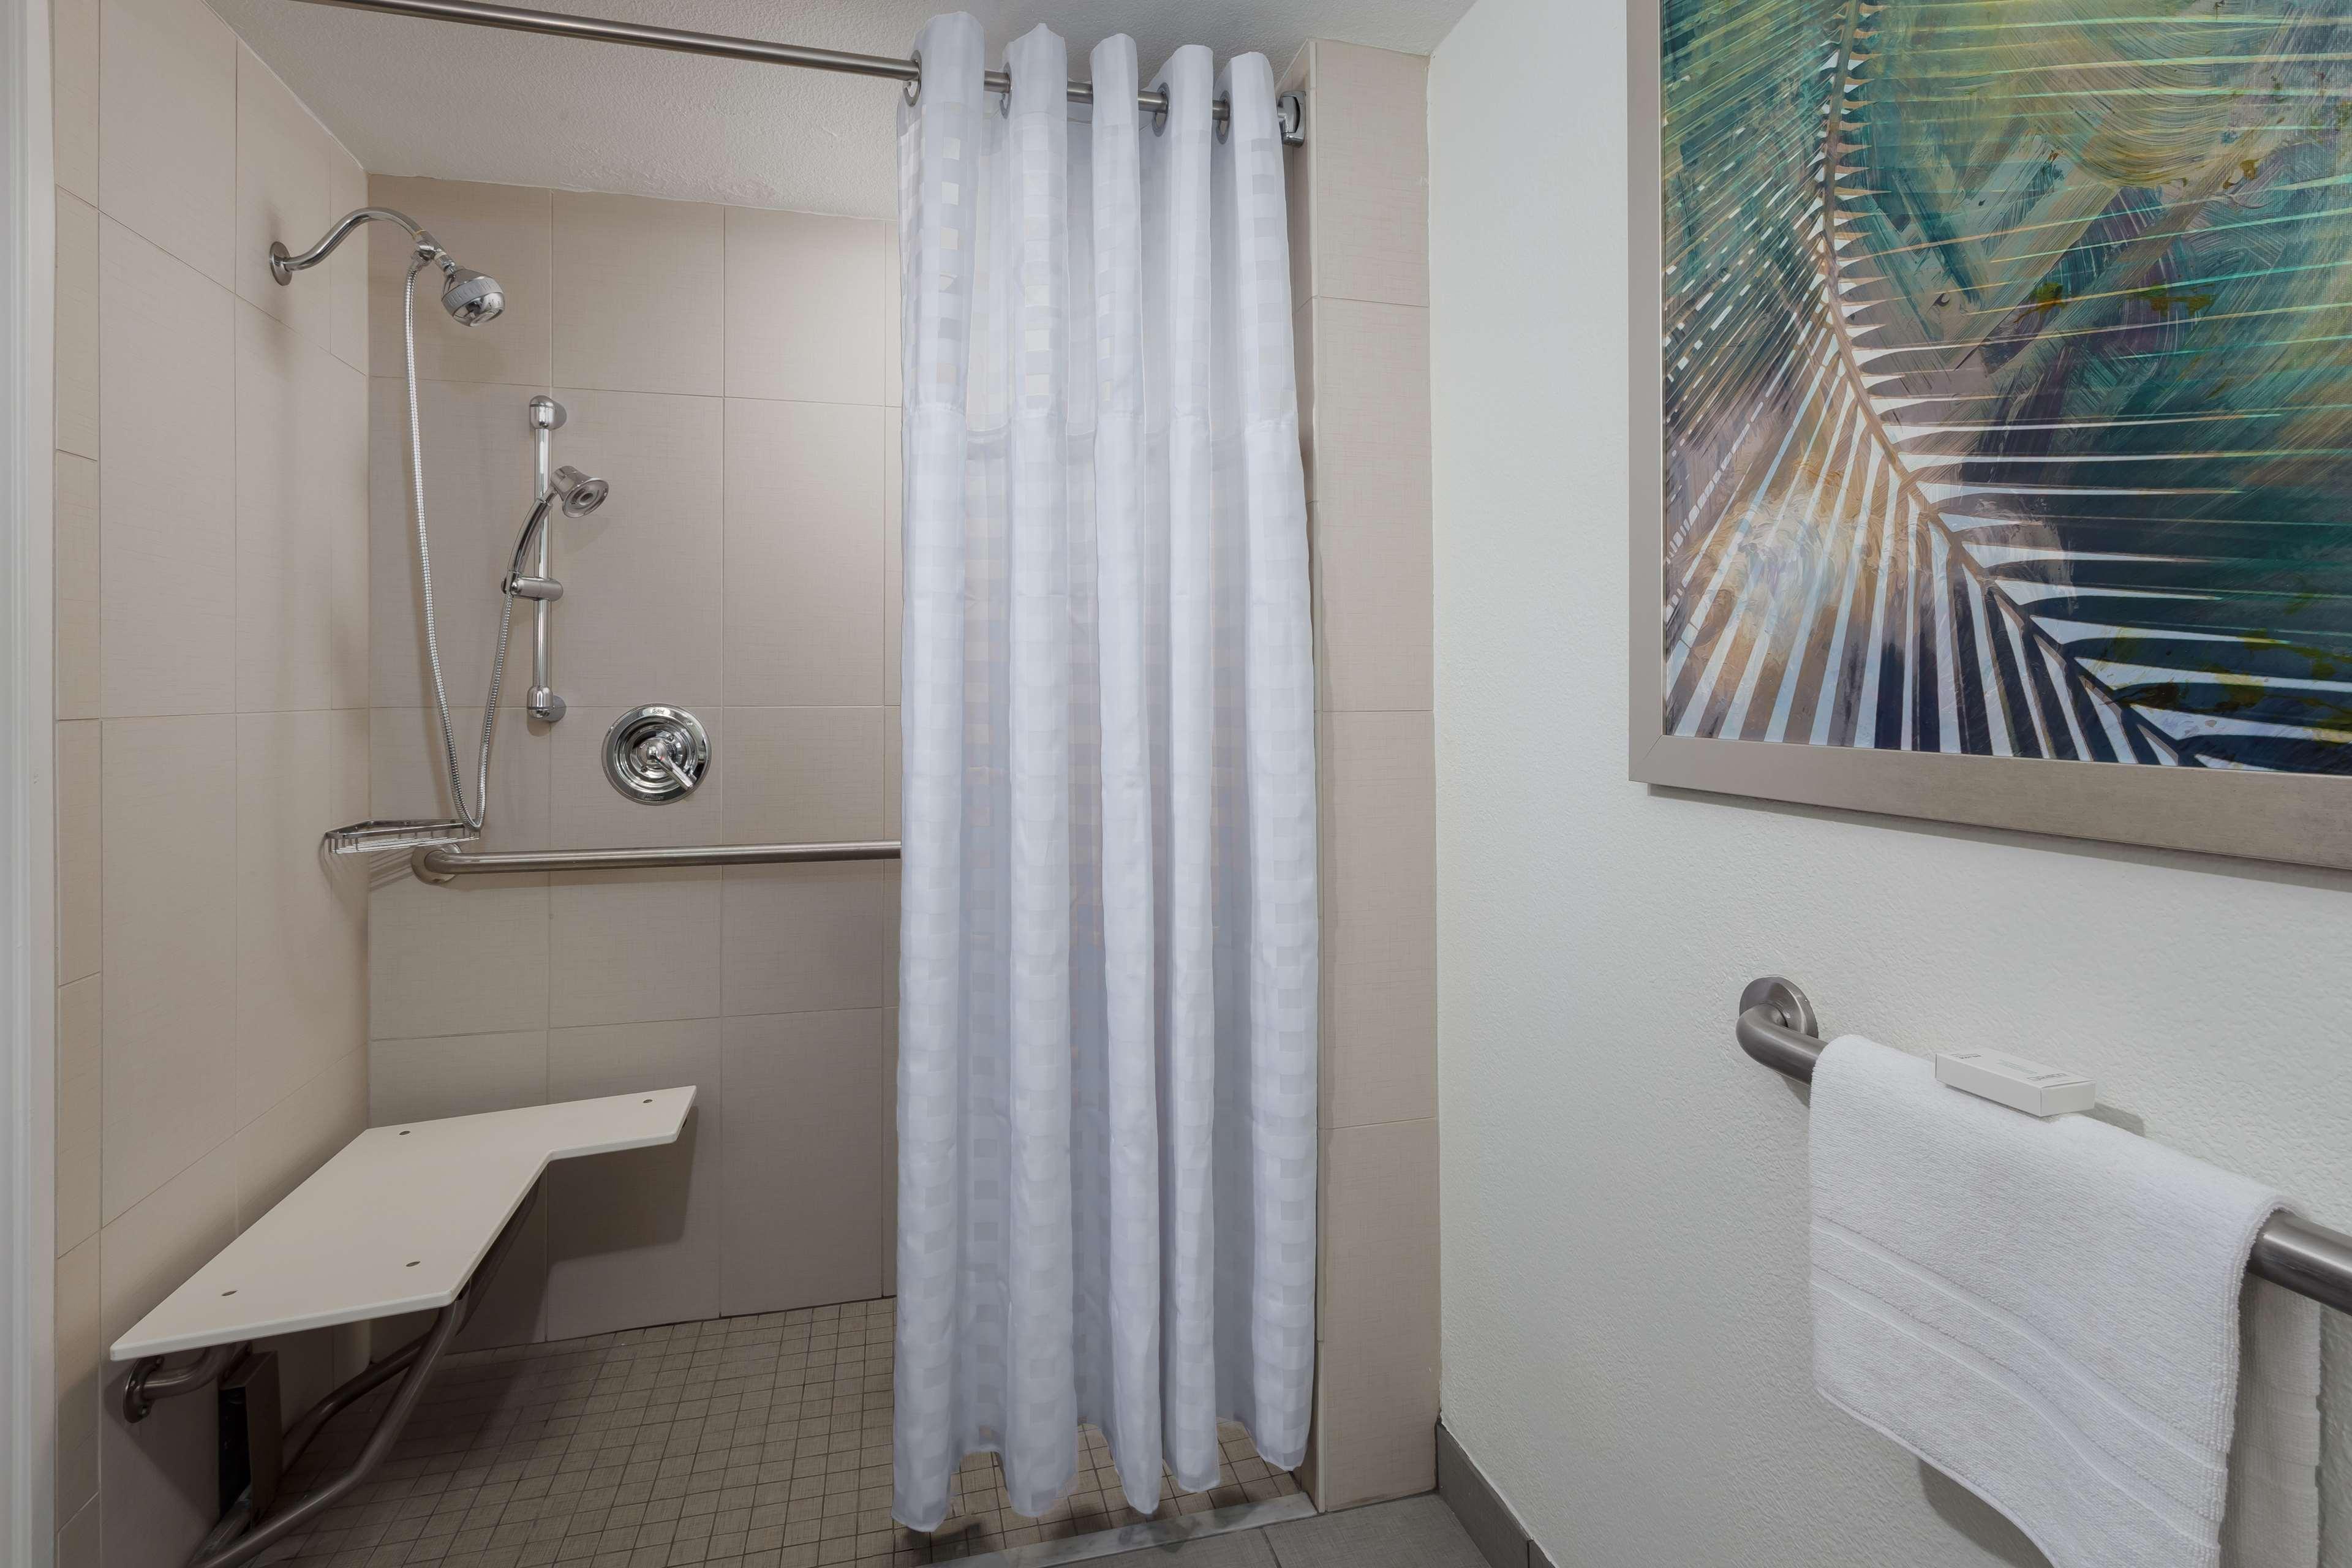 Embassy Suites by Hilton Orlando Lake Buena Vista Resort image 21